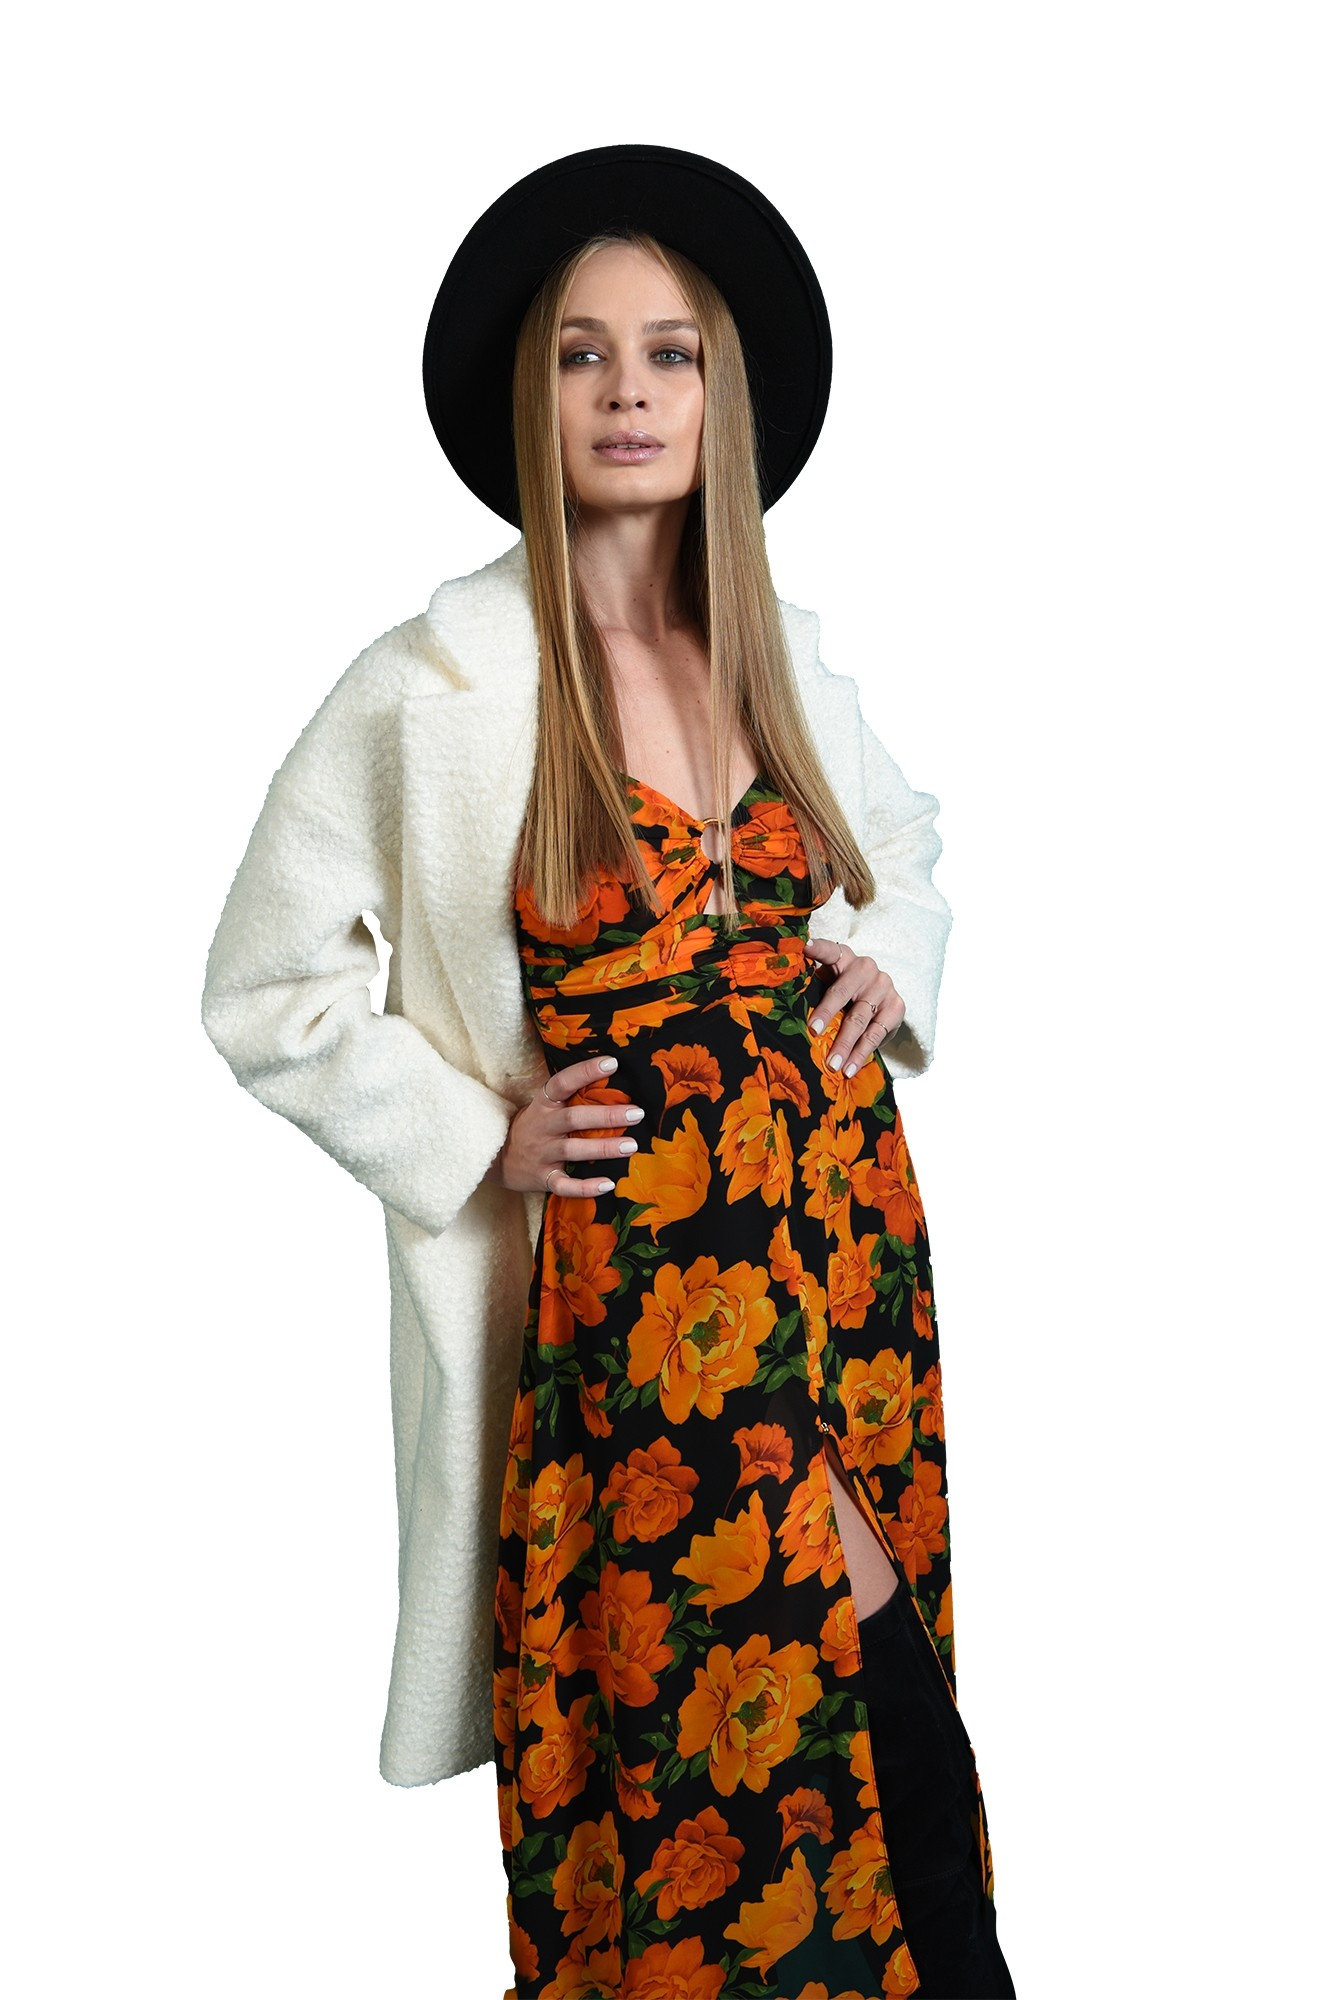 3 - rochie florala, cu bust fronsat, cu accesoriu